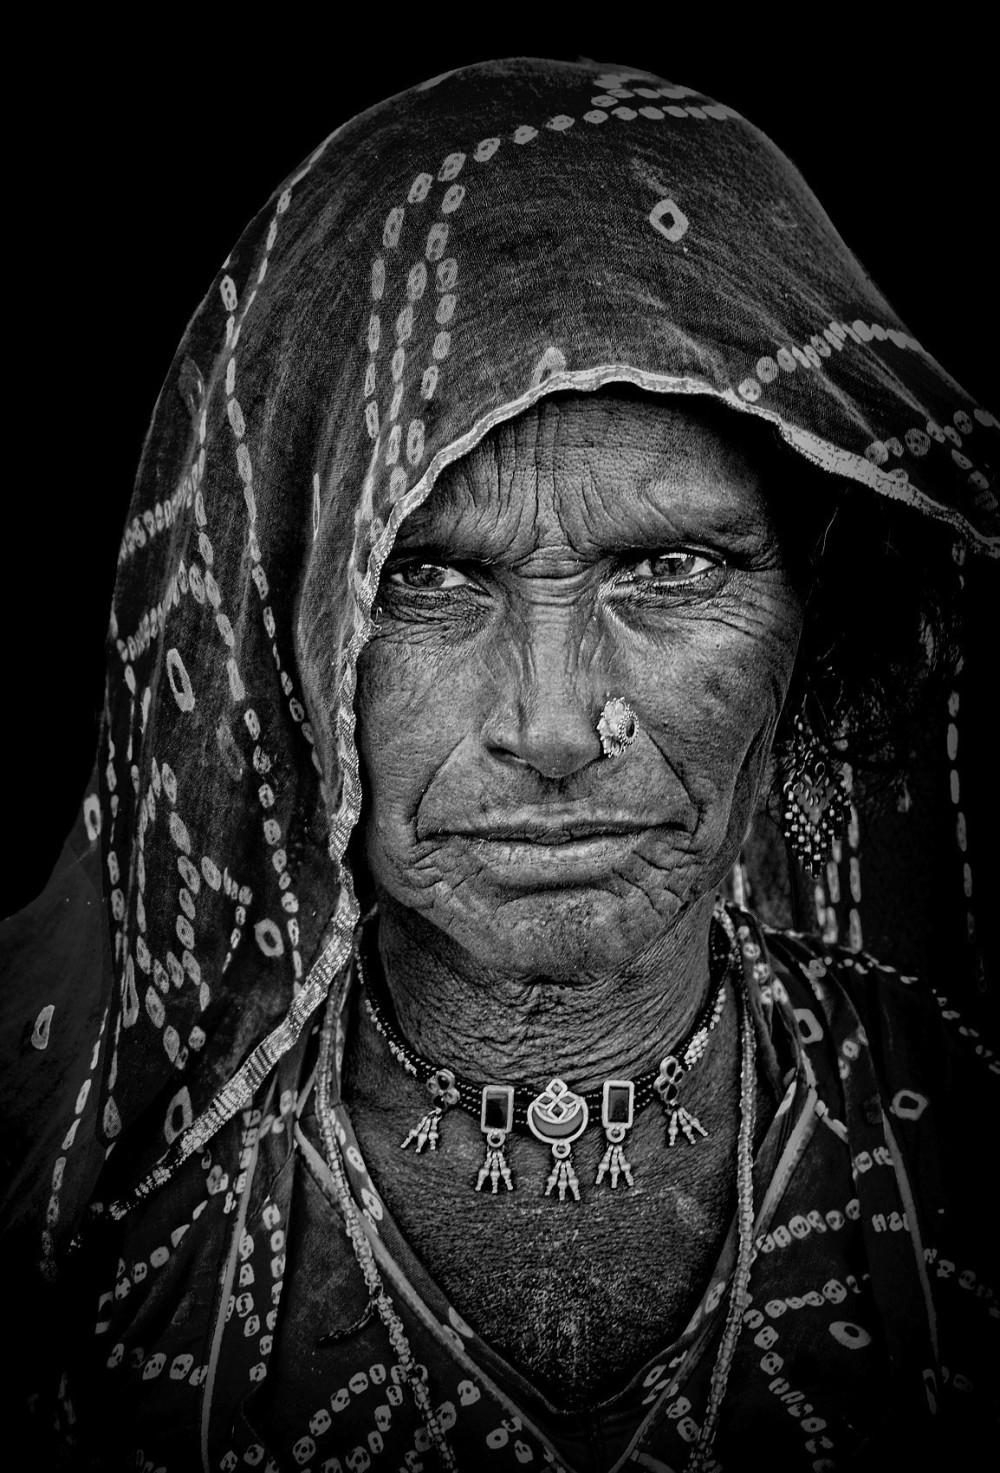 rajasthani monochrome street portrait natural lite